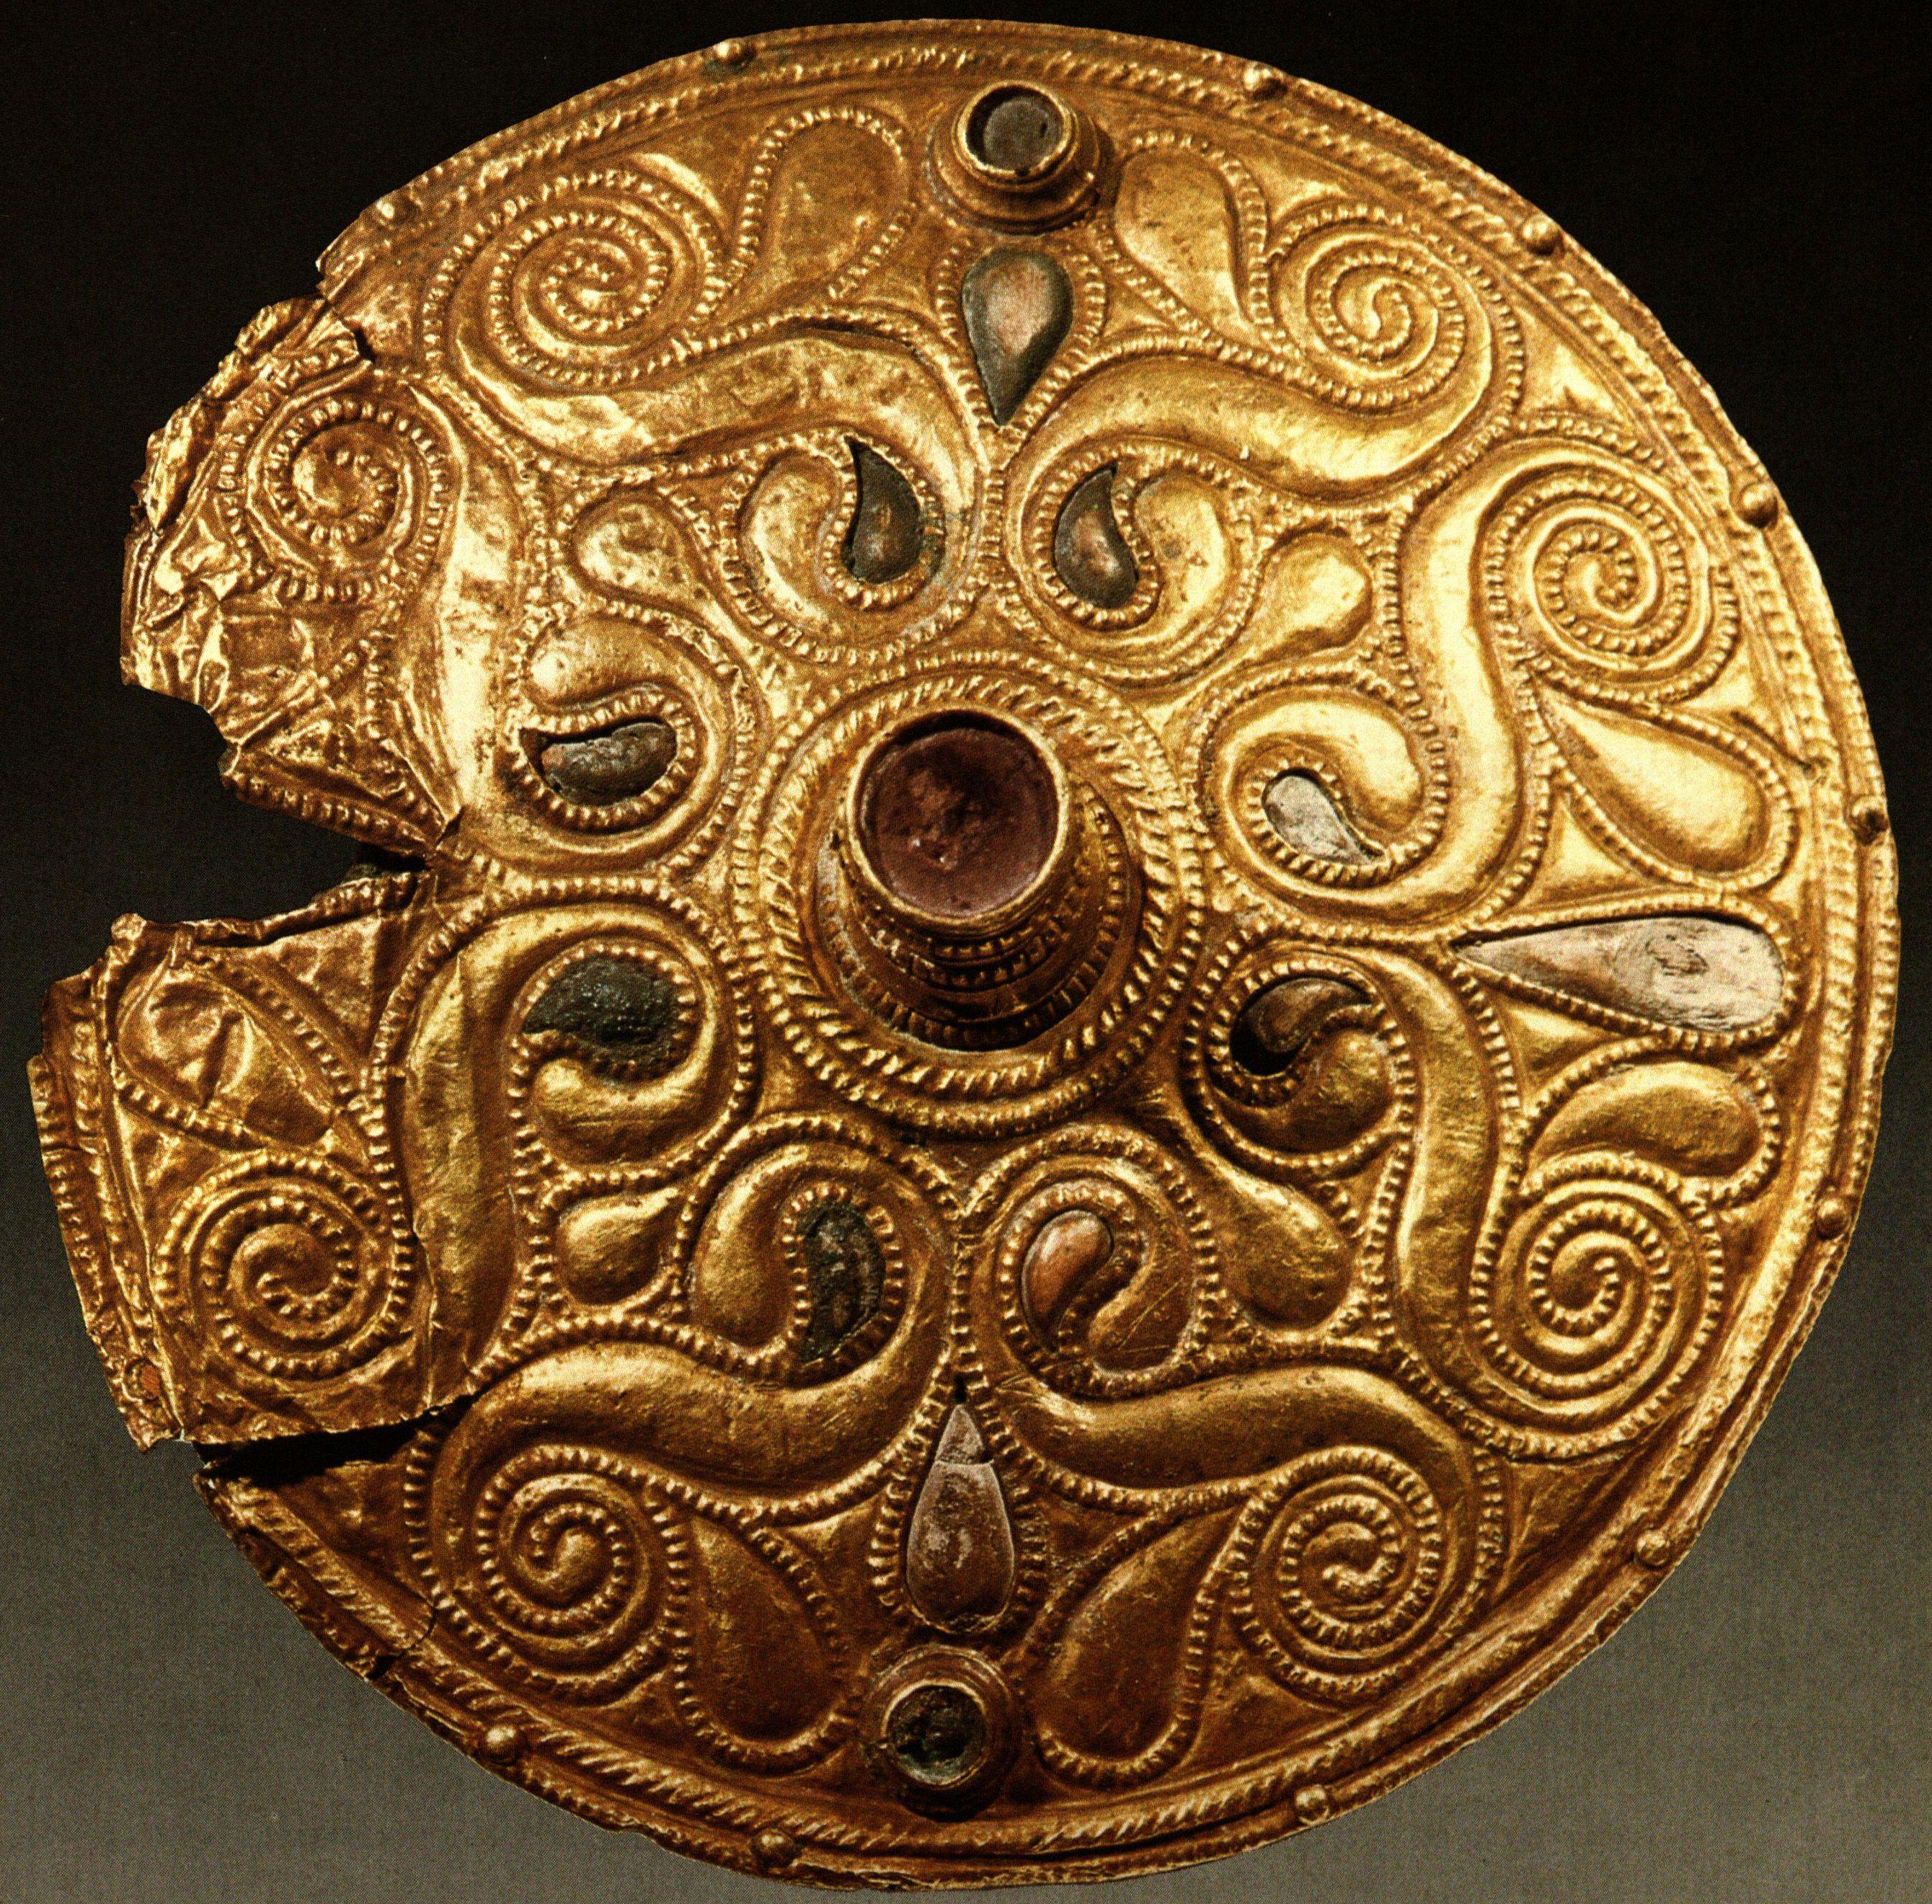 Disc Brooch France 4th Century Bc Celtic Art Celtic Culture